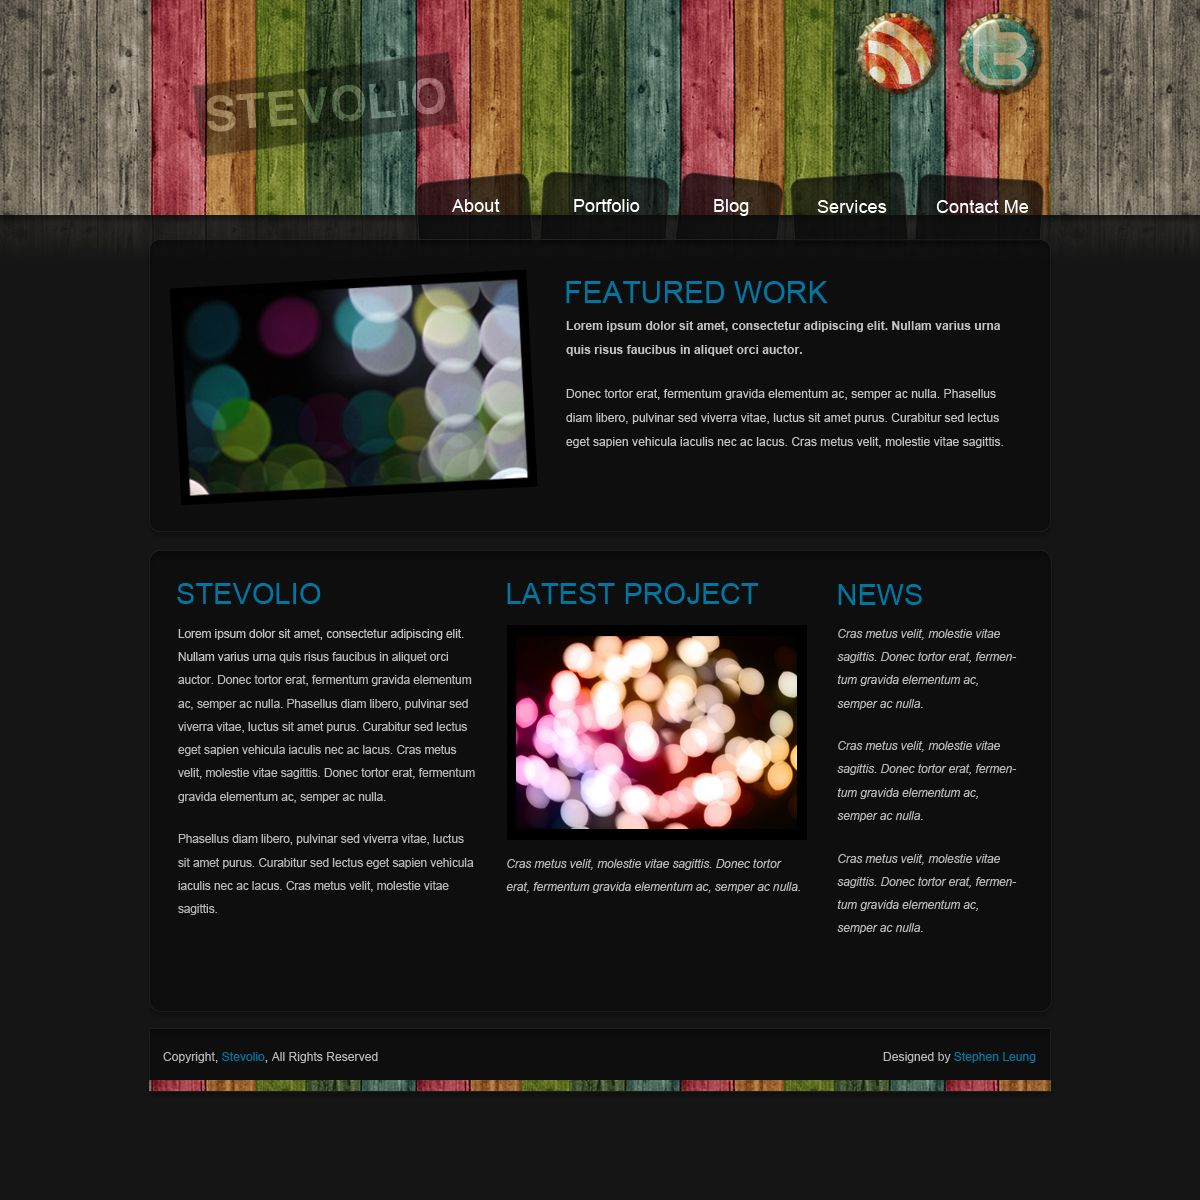 Web Design Portfolio Examples: Portfolio Website Layout Ideas - Google Search